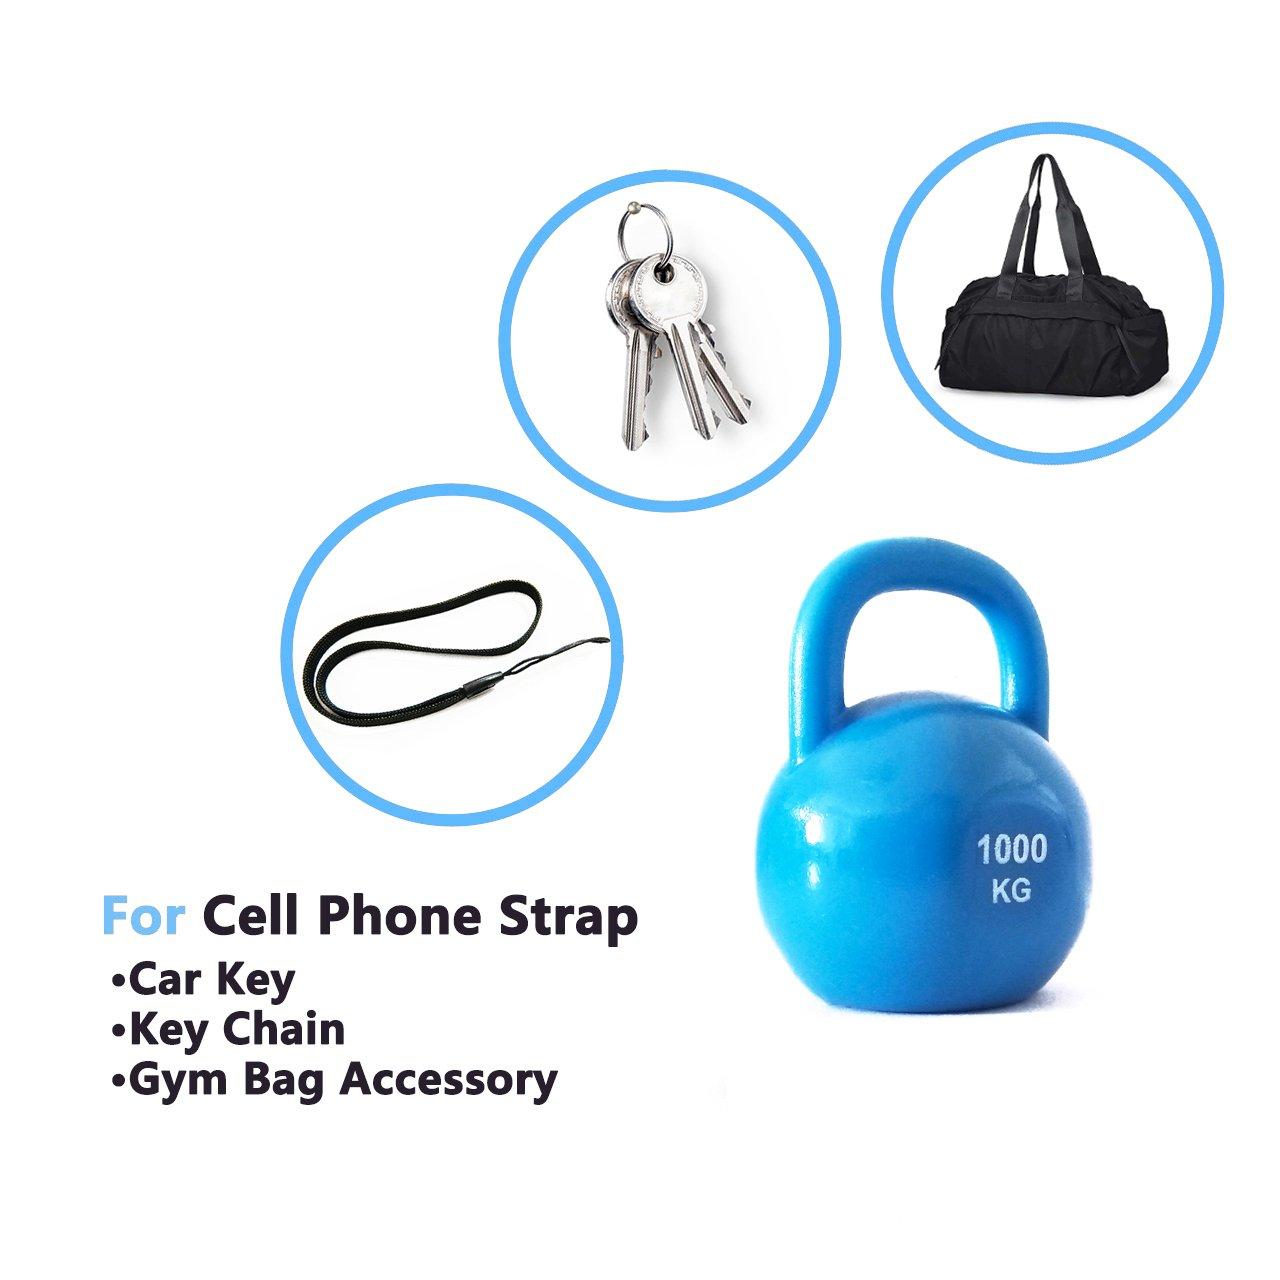 Amazon.com: Mini Pesa rusa (Key cadena teléfono celular ...